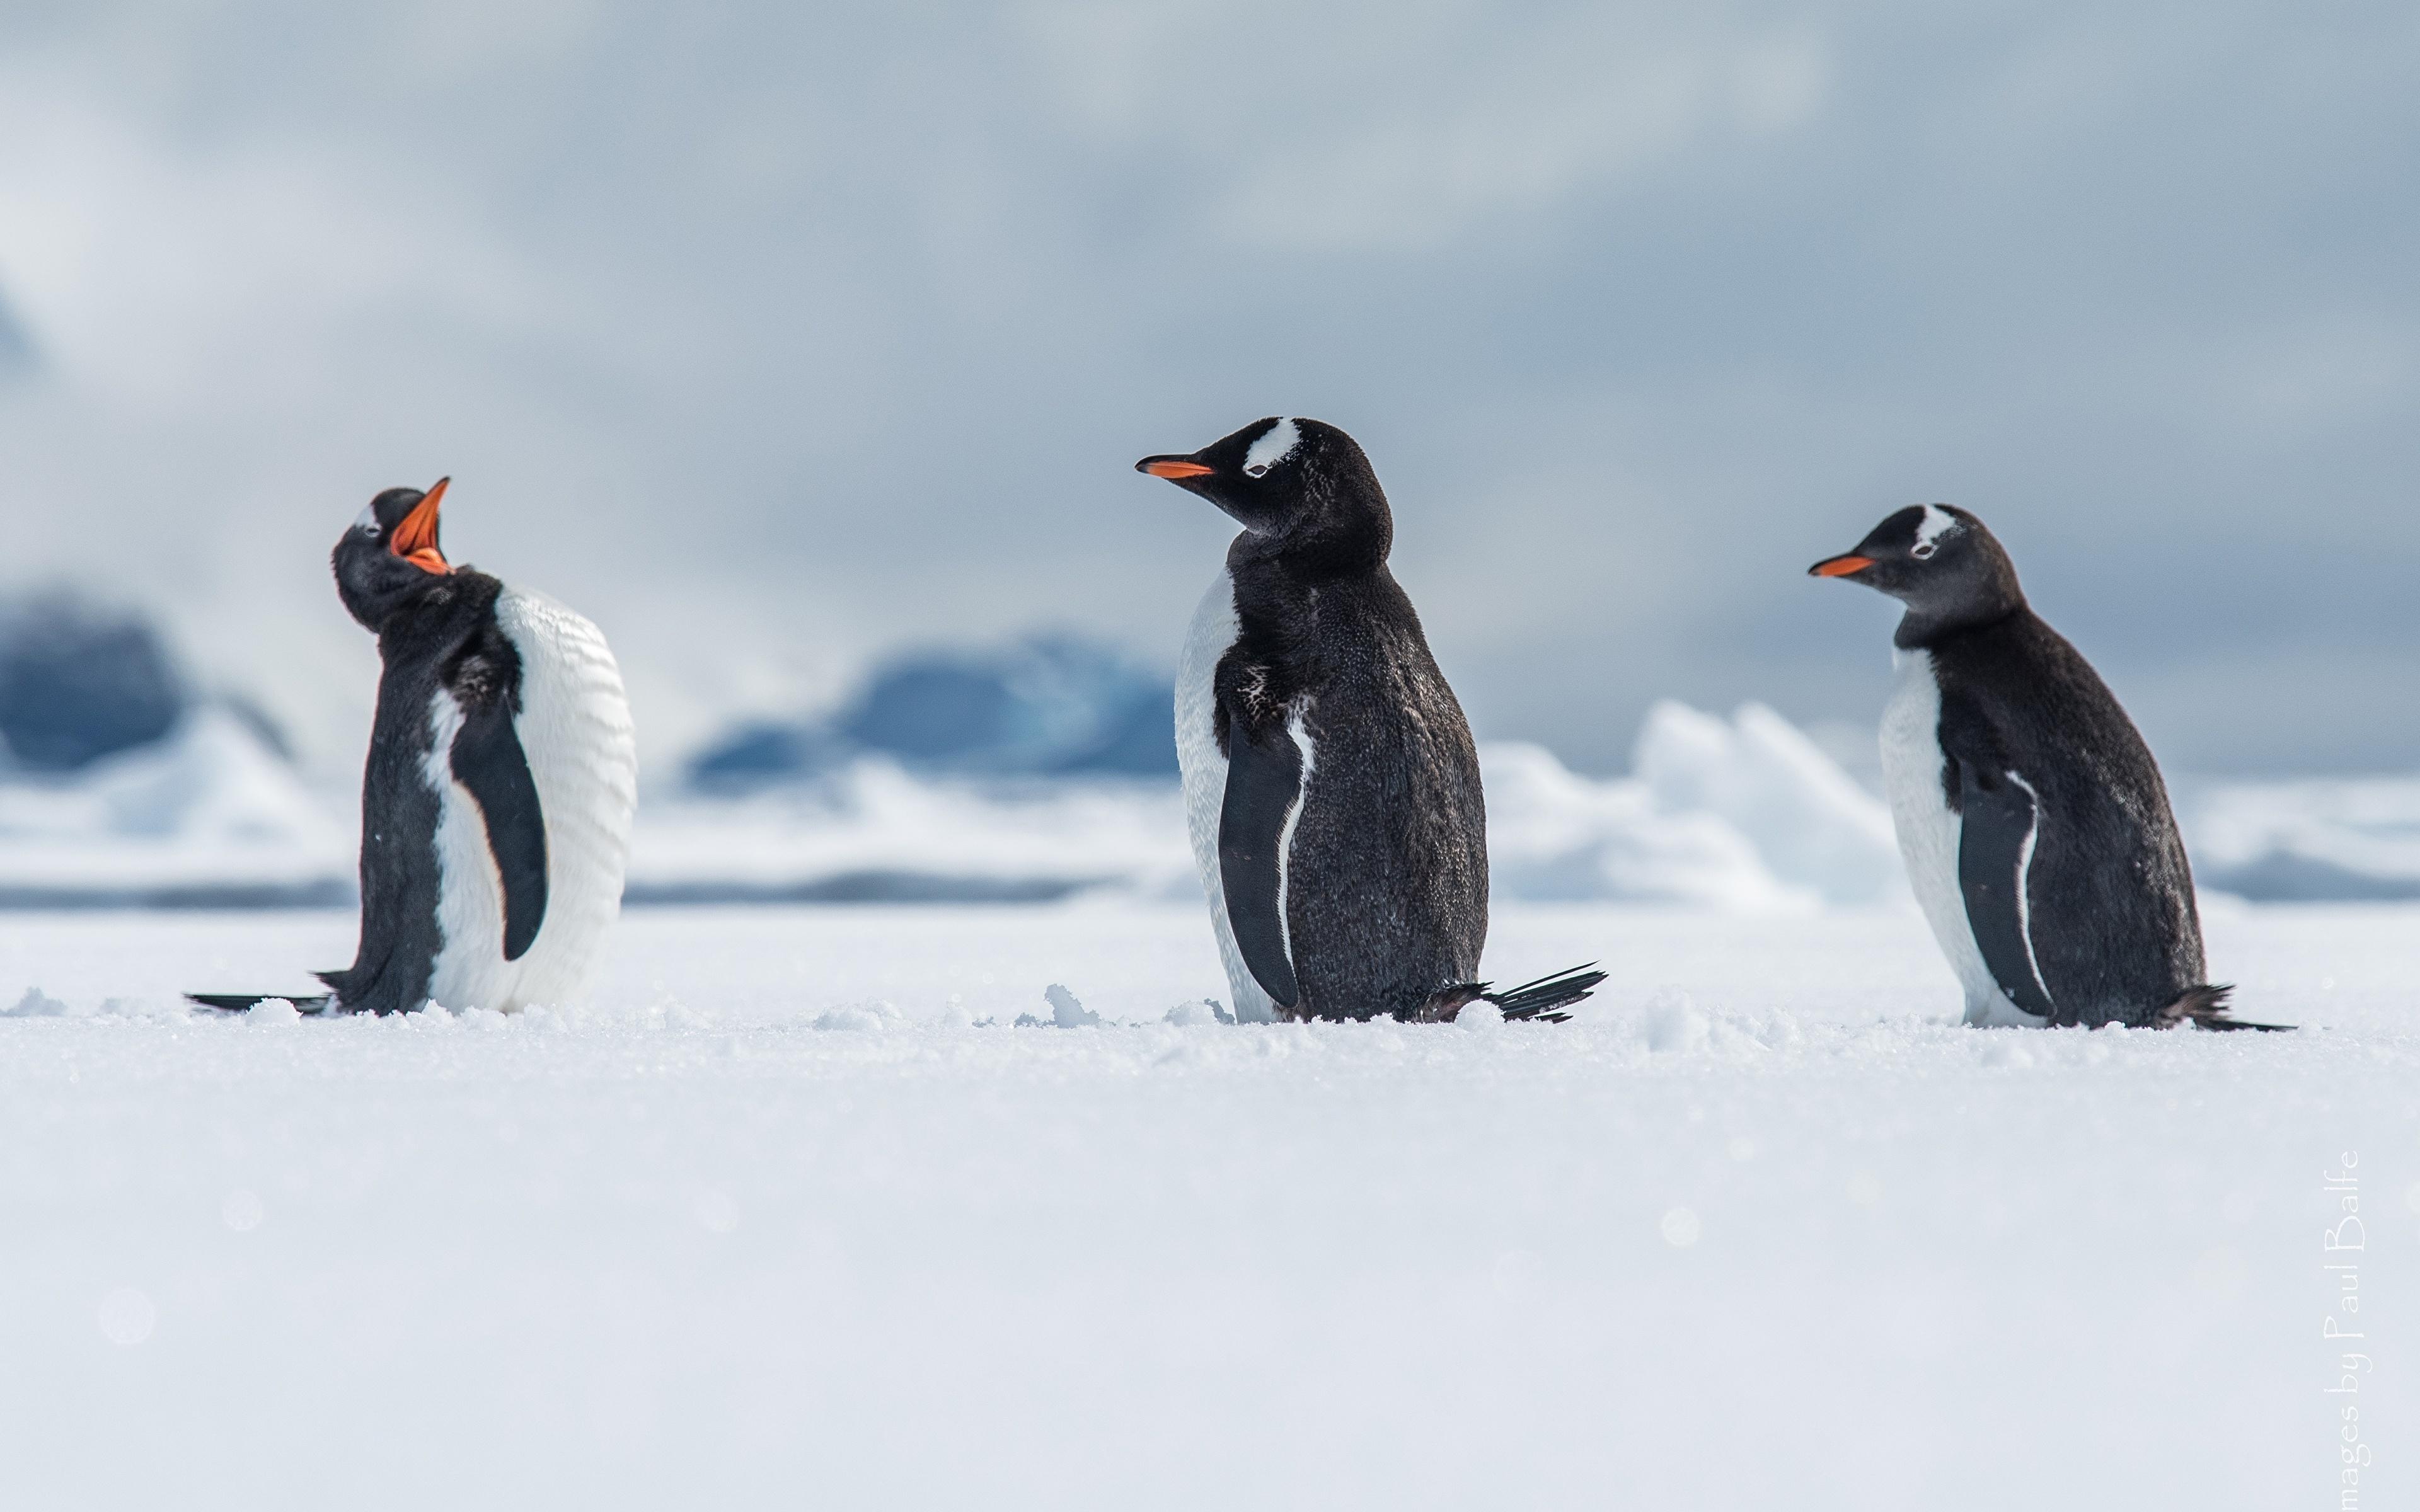 Penguin Desktop 4k , HD Wallpaper & Backgrounds